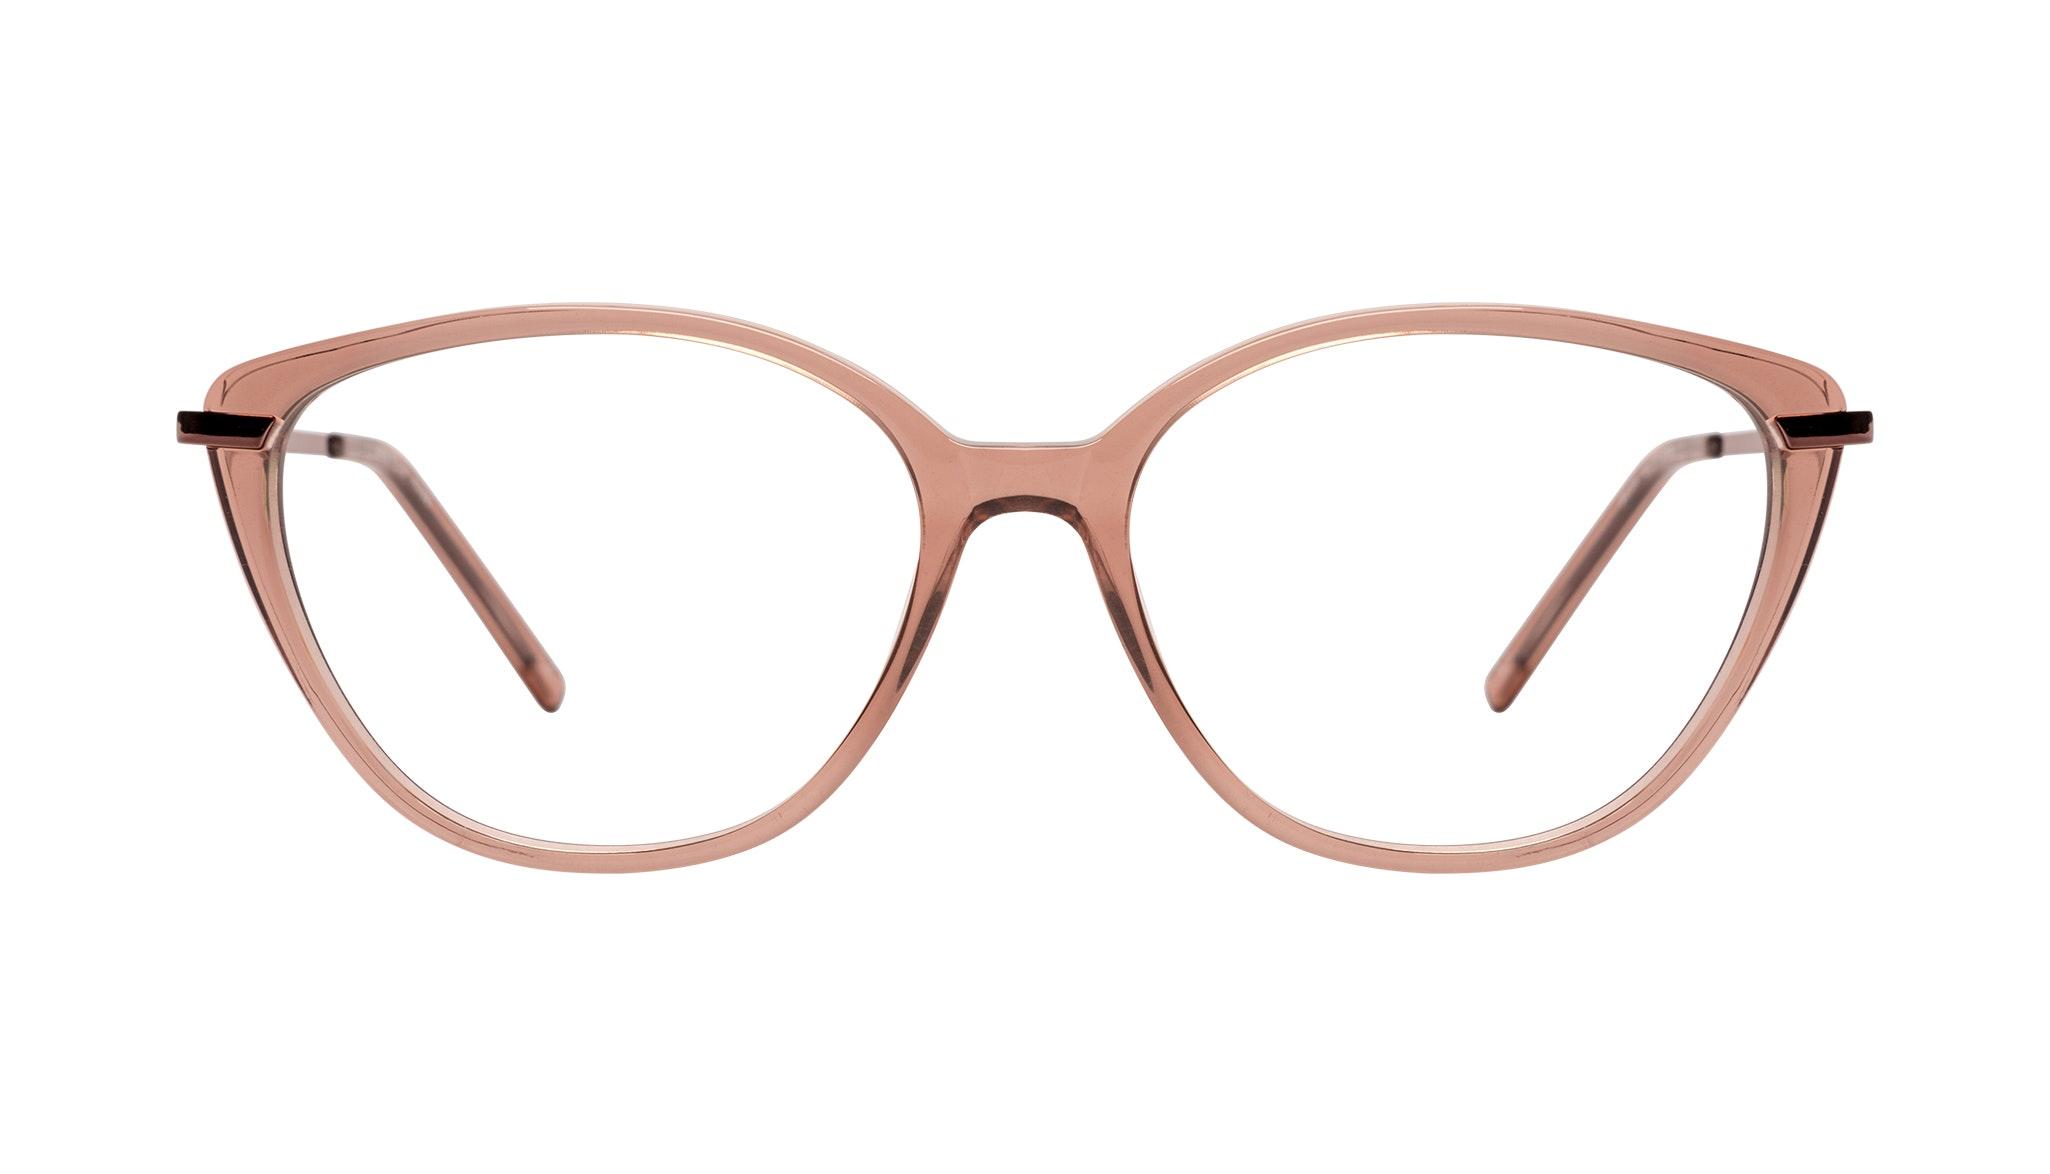 Affordable Fashion Glasses Cat Eye Eyeglasses Women Illusion Plus Rose